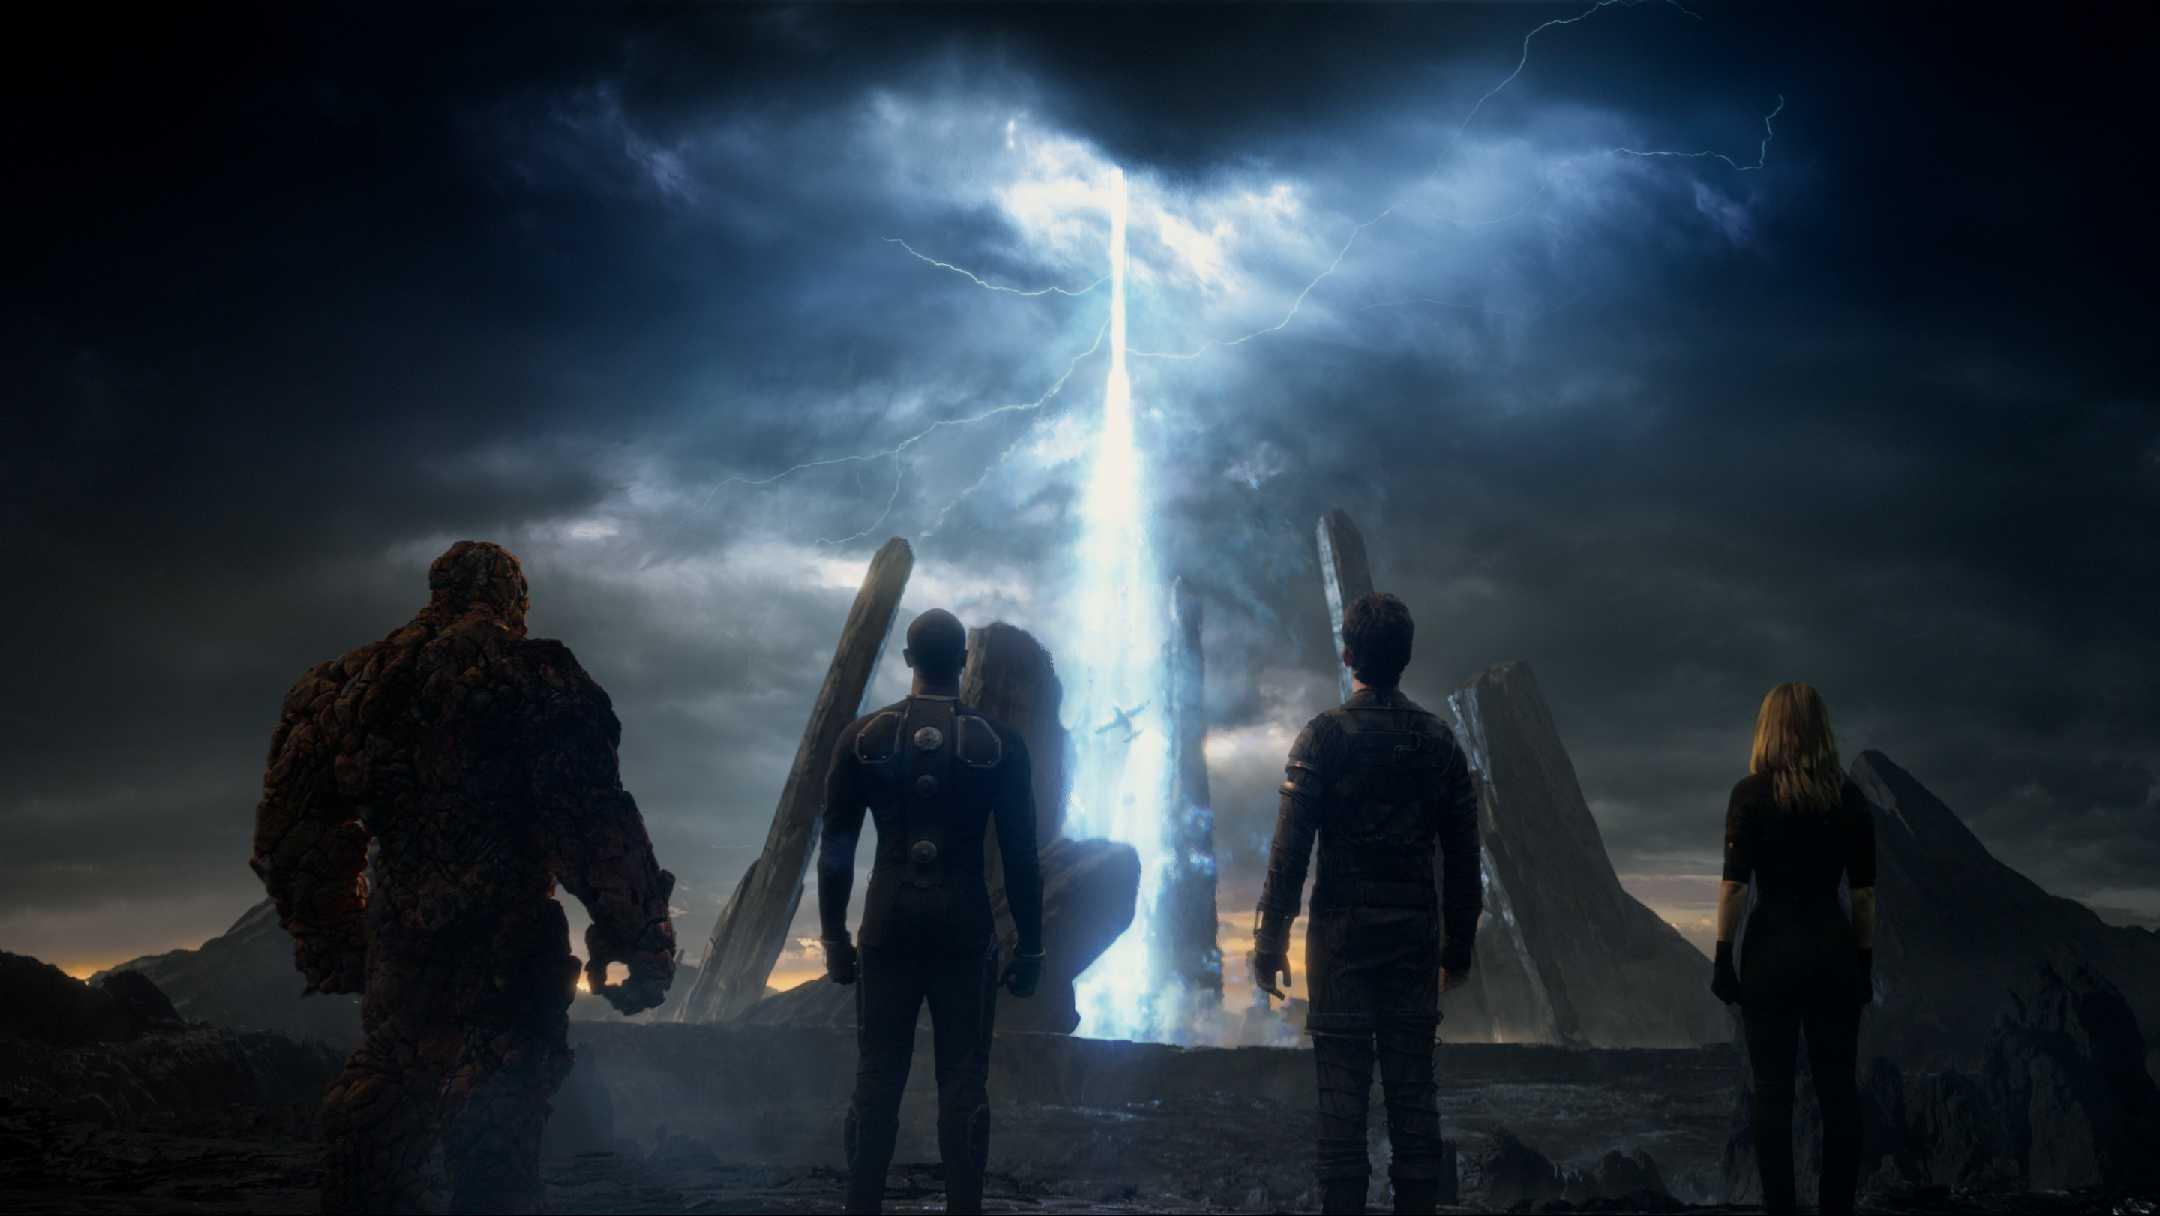 The cast of Josh Trank's The Fantastic Four